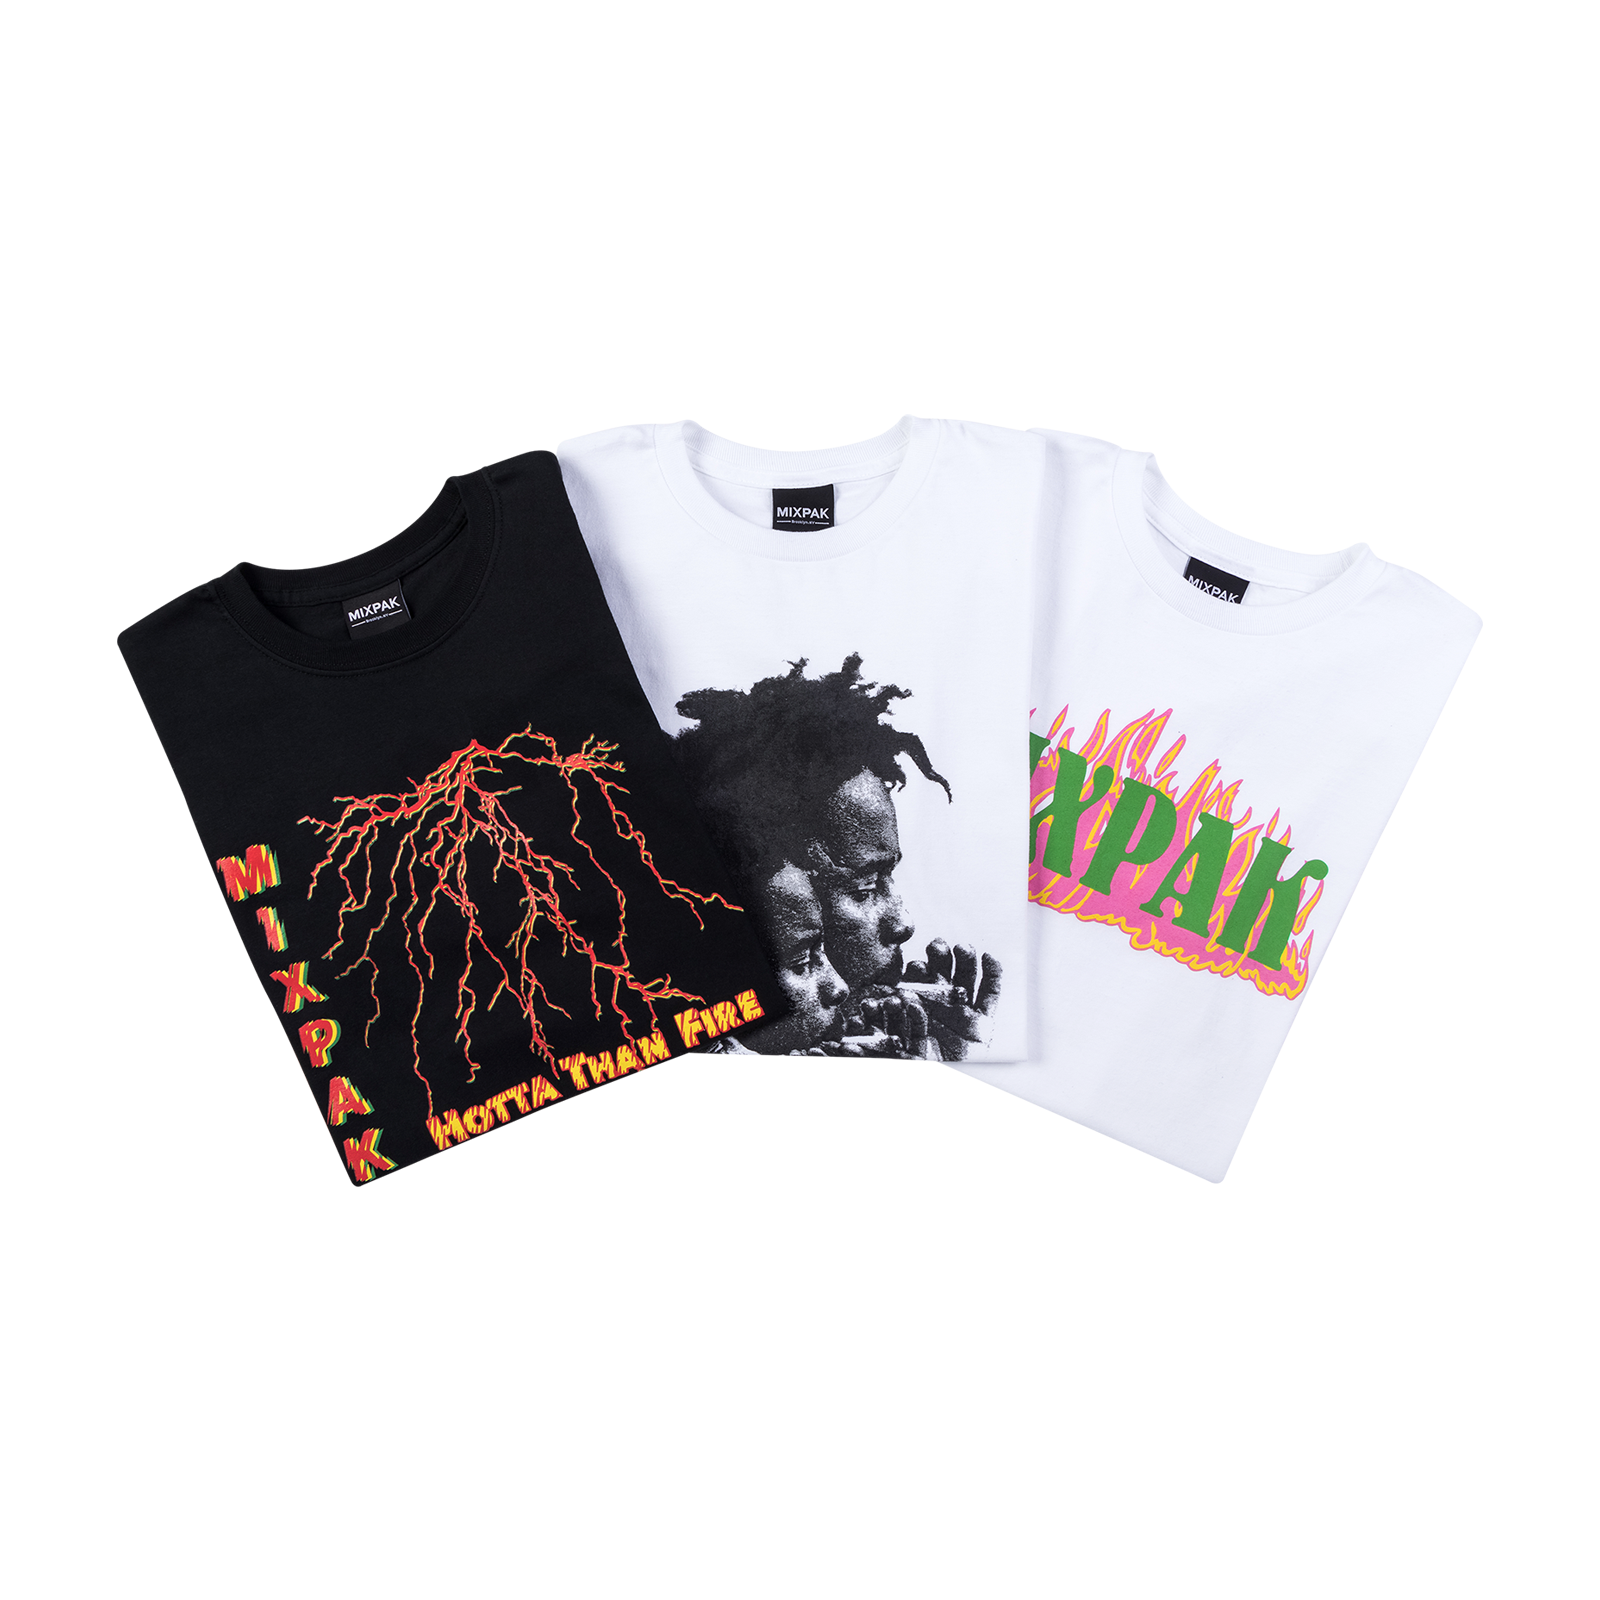 T-shirts product image